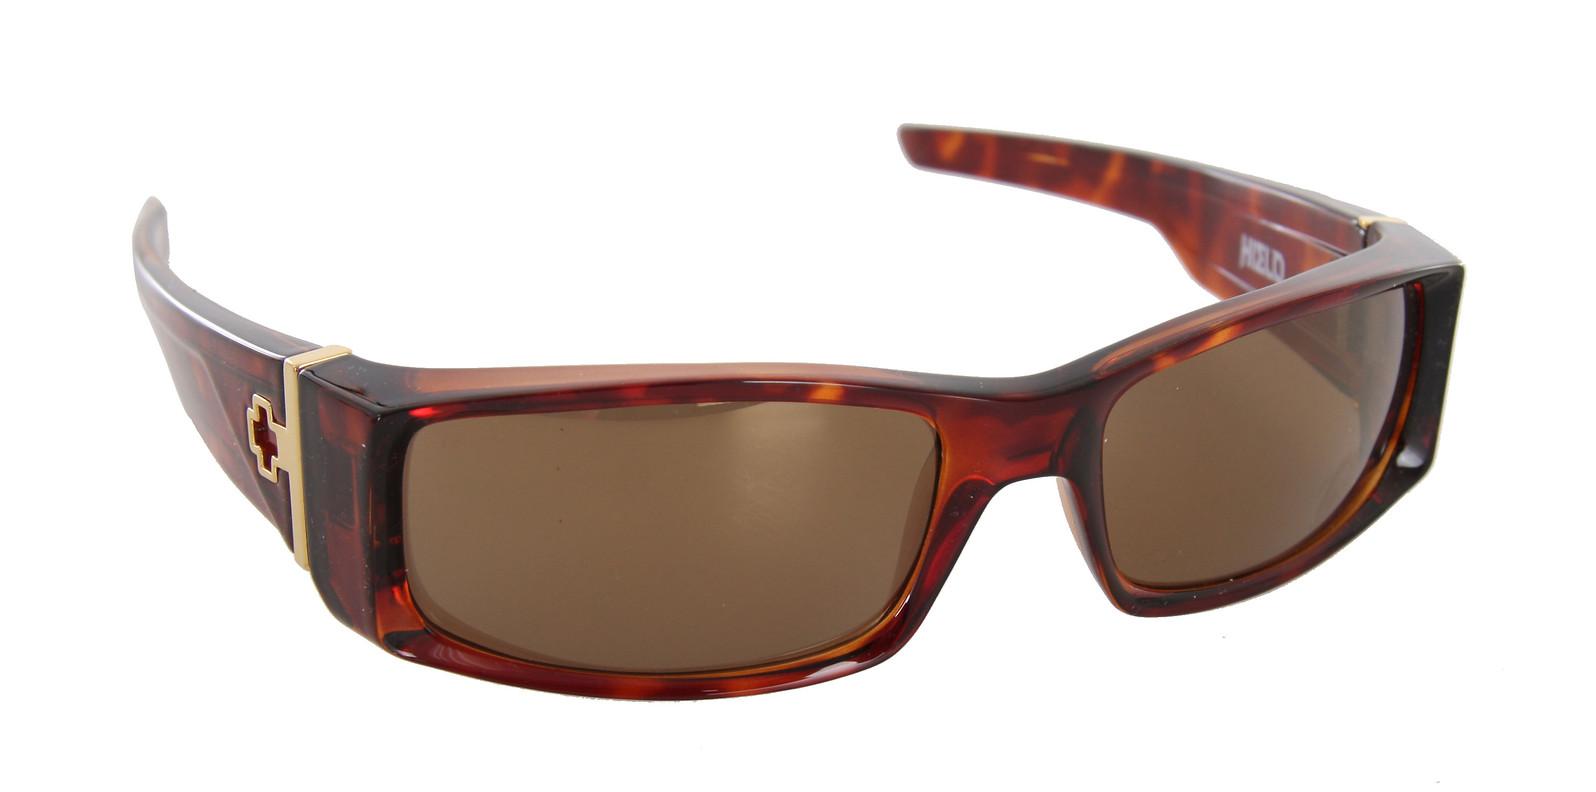 Spy Optic Spy Hielo Sunglasses Classic Tortoise Bronze/Gold Mirr Lens  spy-helio-sngls-tortbrnzgldmirror-10.jpg